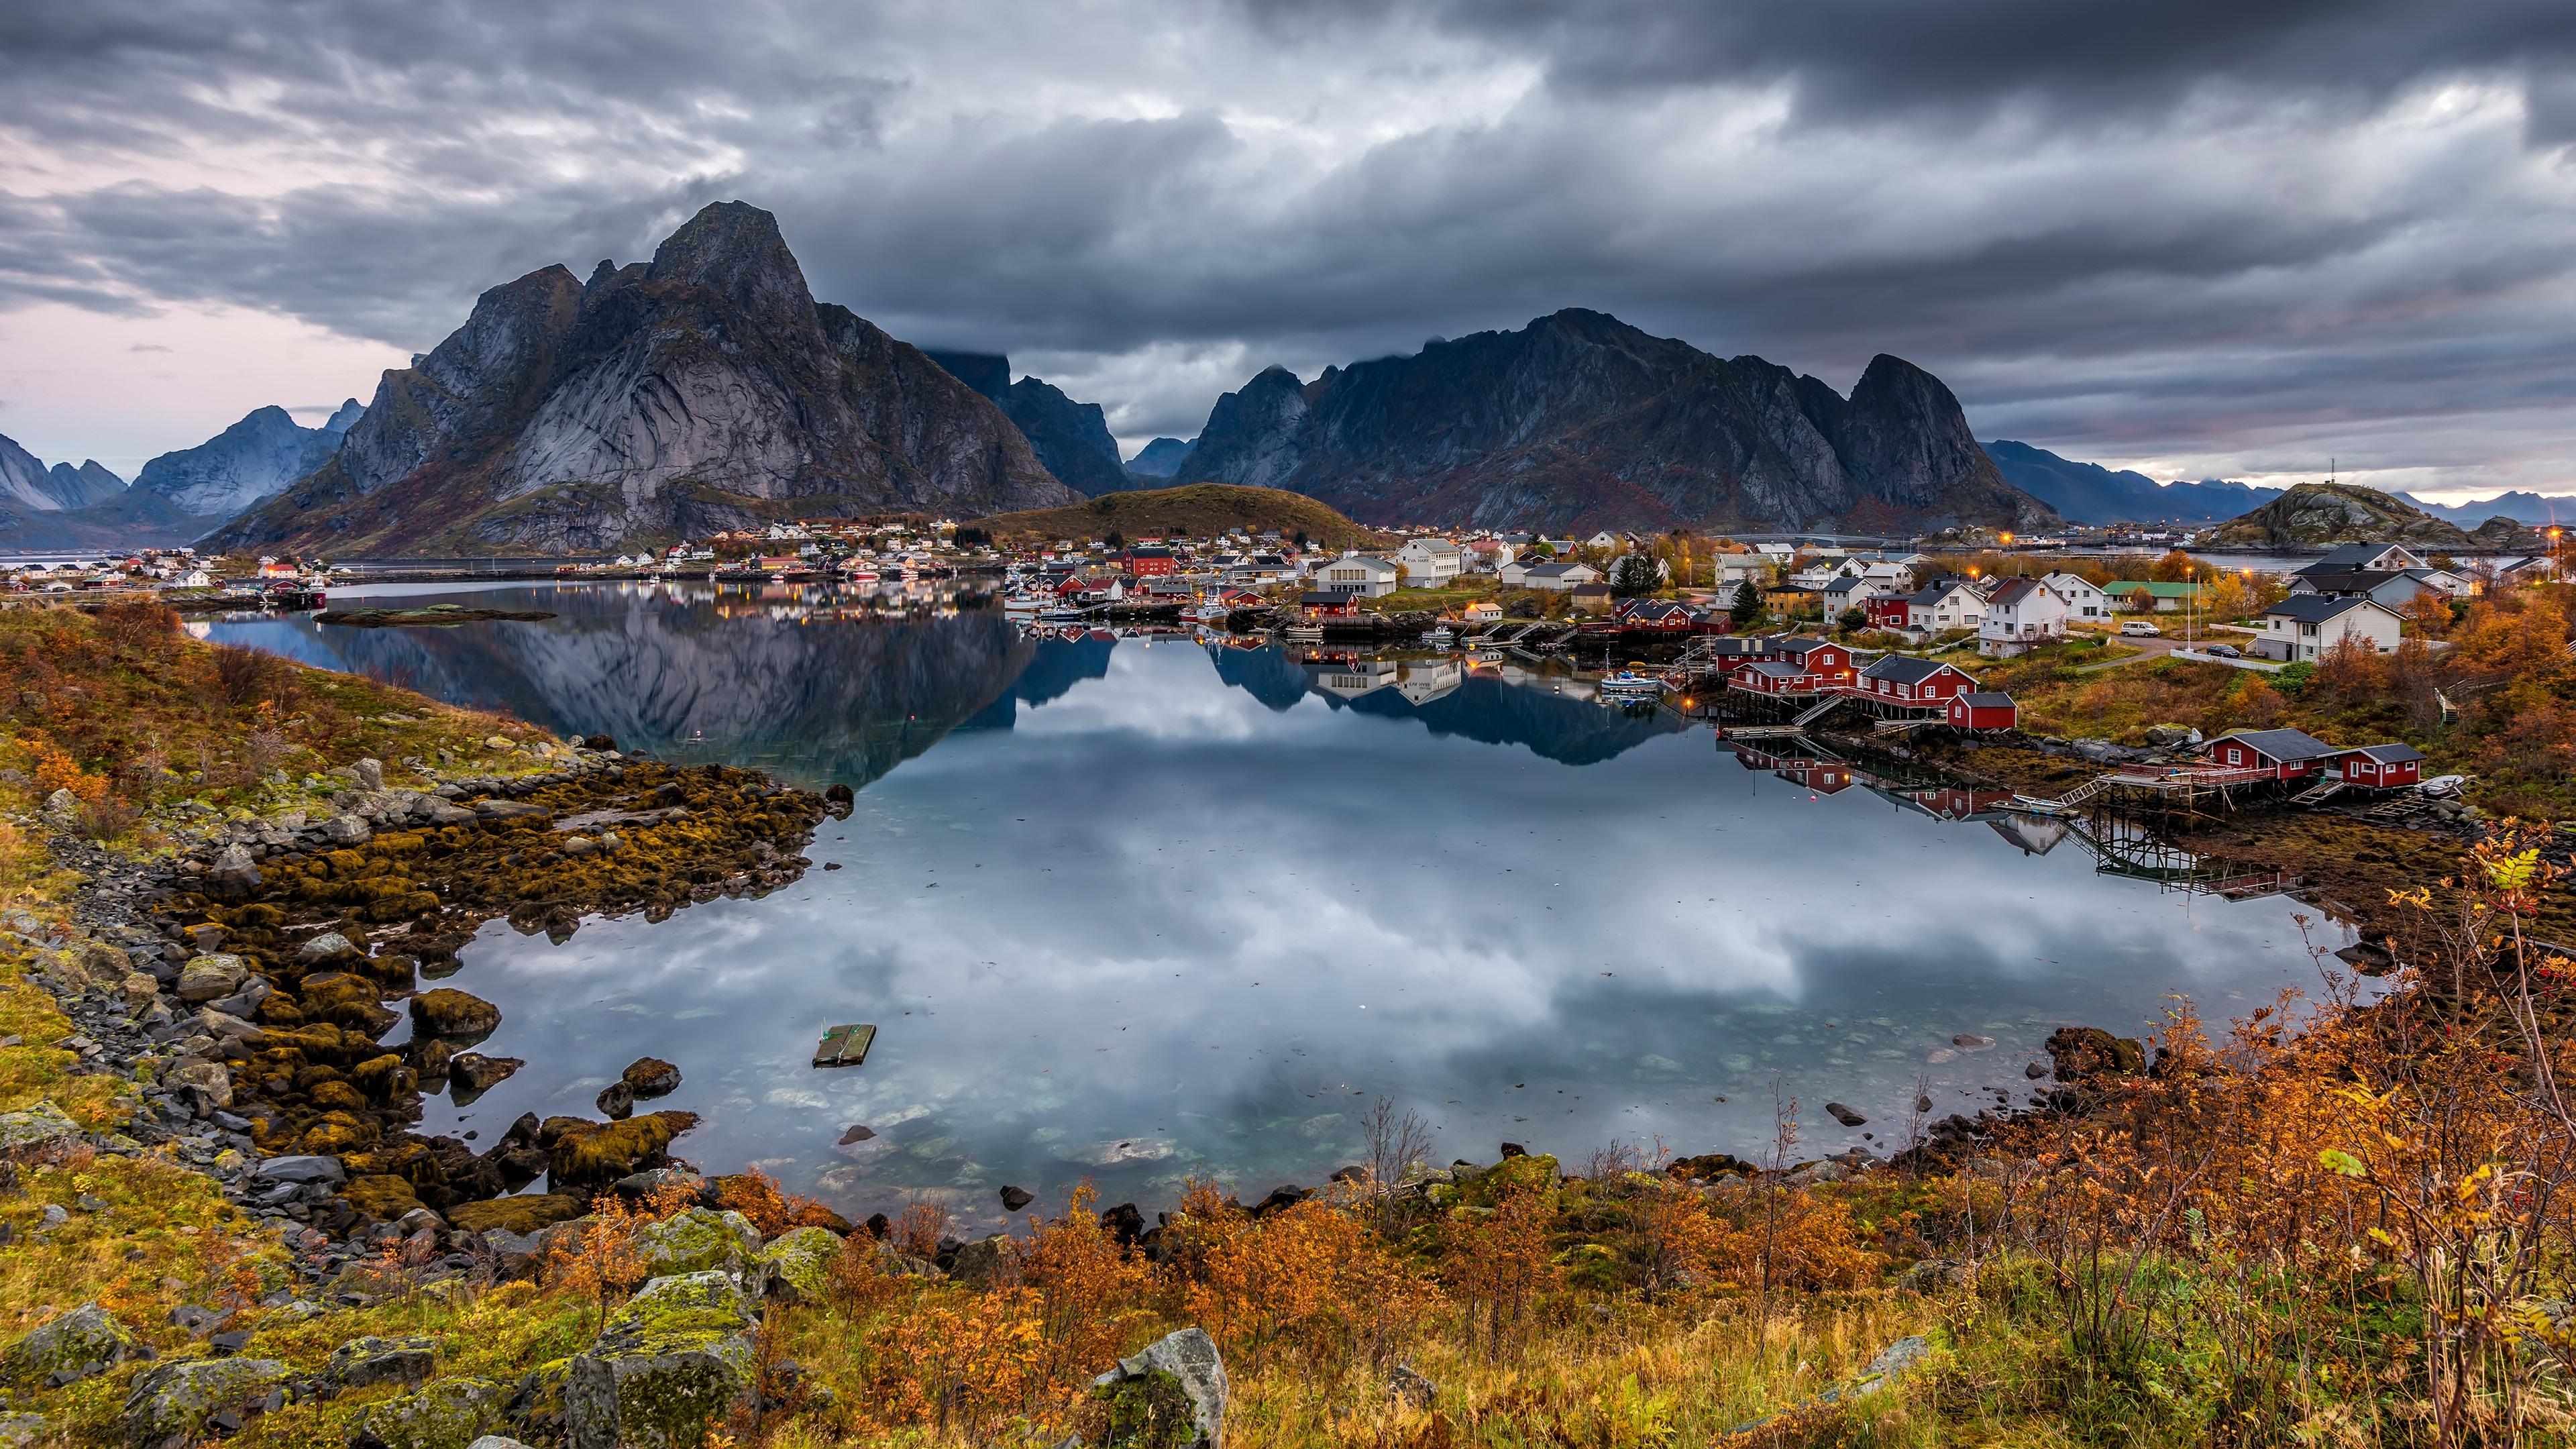 Wallpaper Norway City Lake Mountains 3840x2160 Uhd 4k